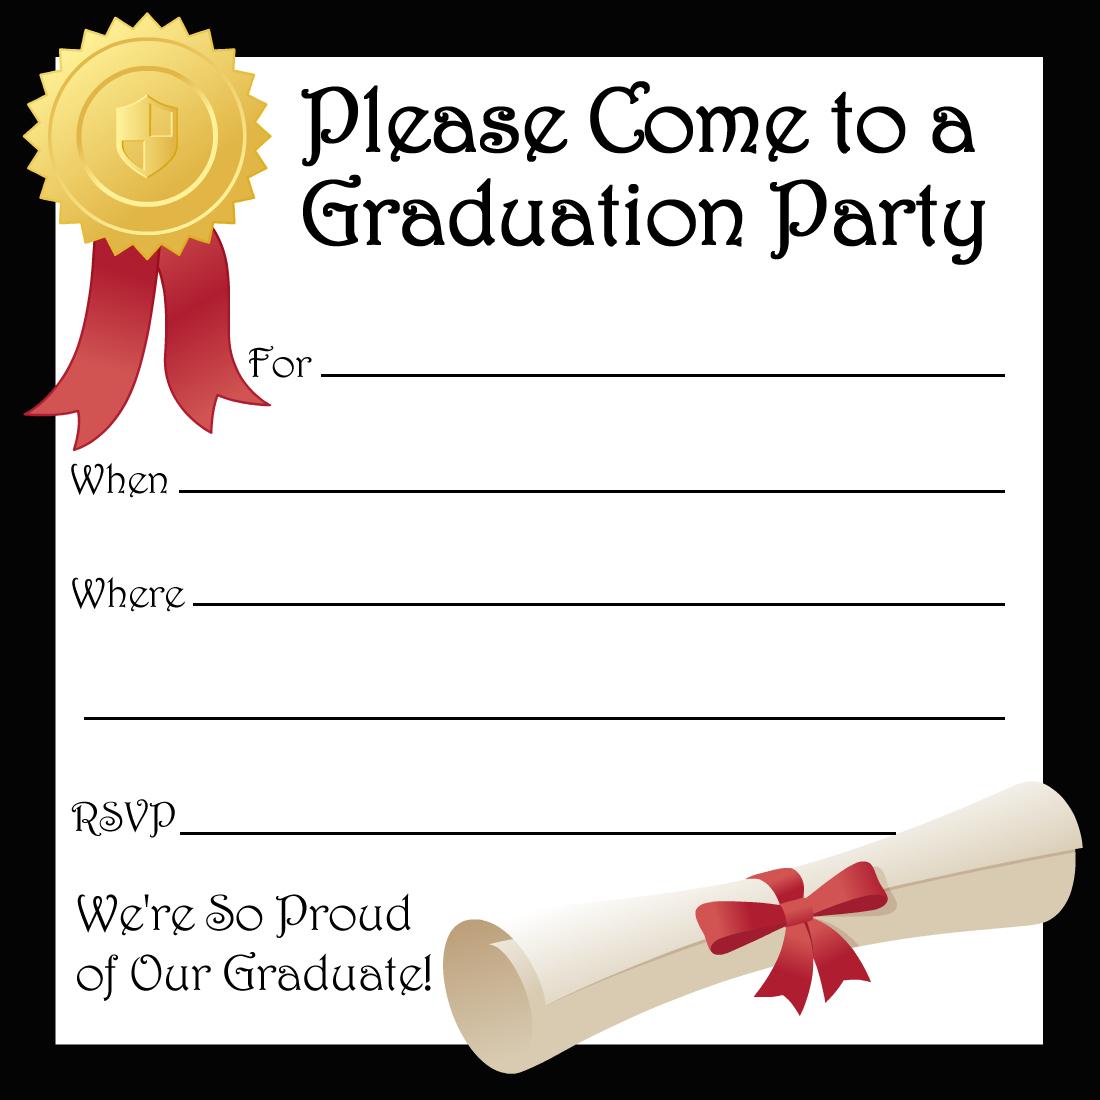 Free Printable Graduation Party Invitations | High School Graduation - Free Printable Graduation Invitations 2014